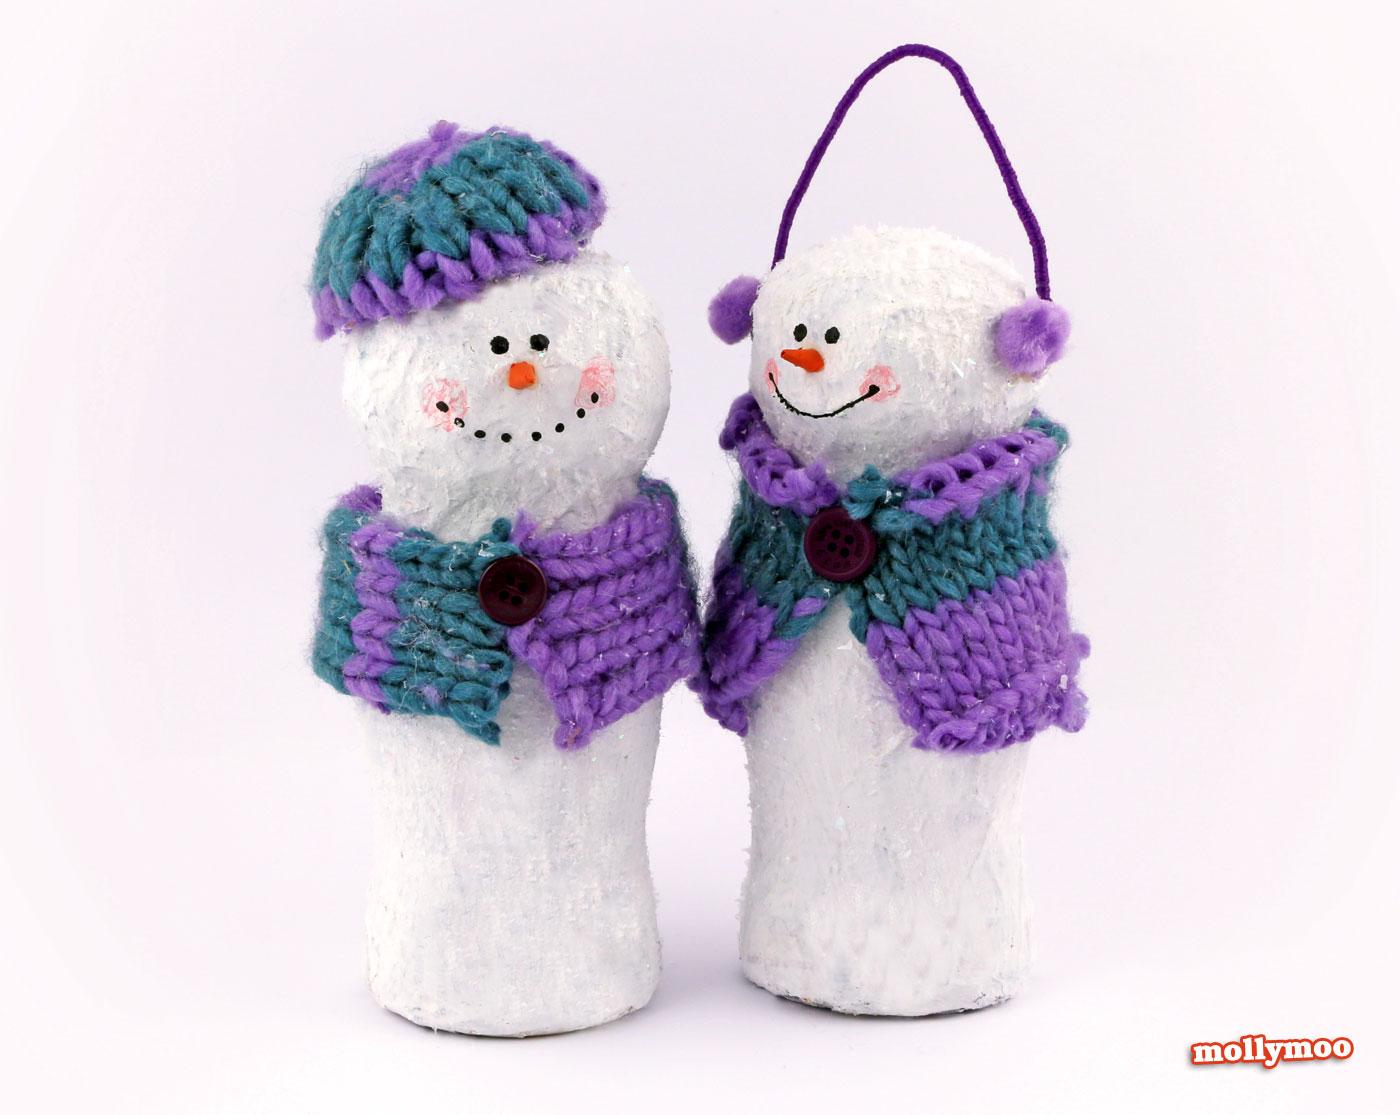 papier-mache-snowman-crafts